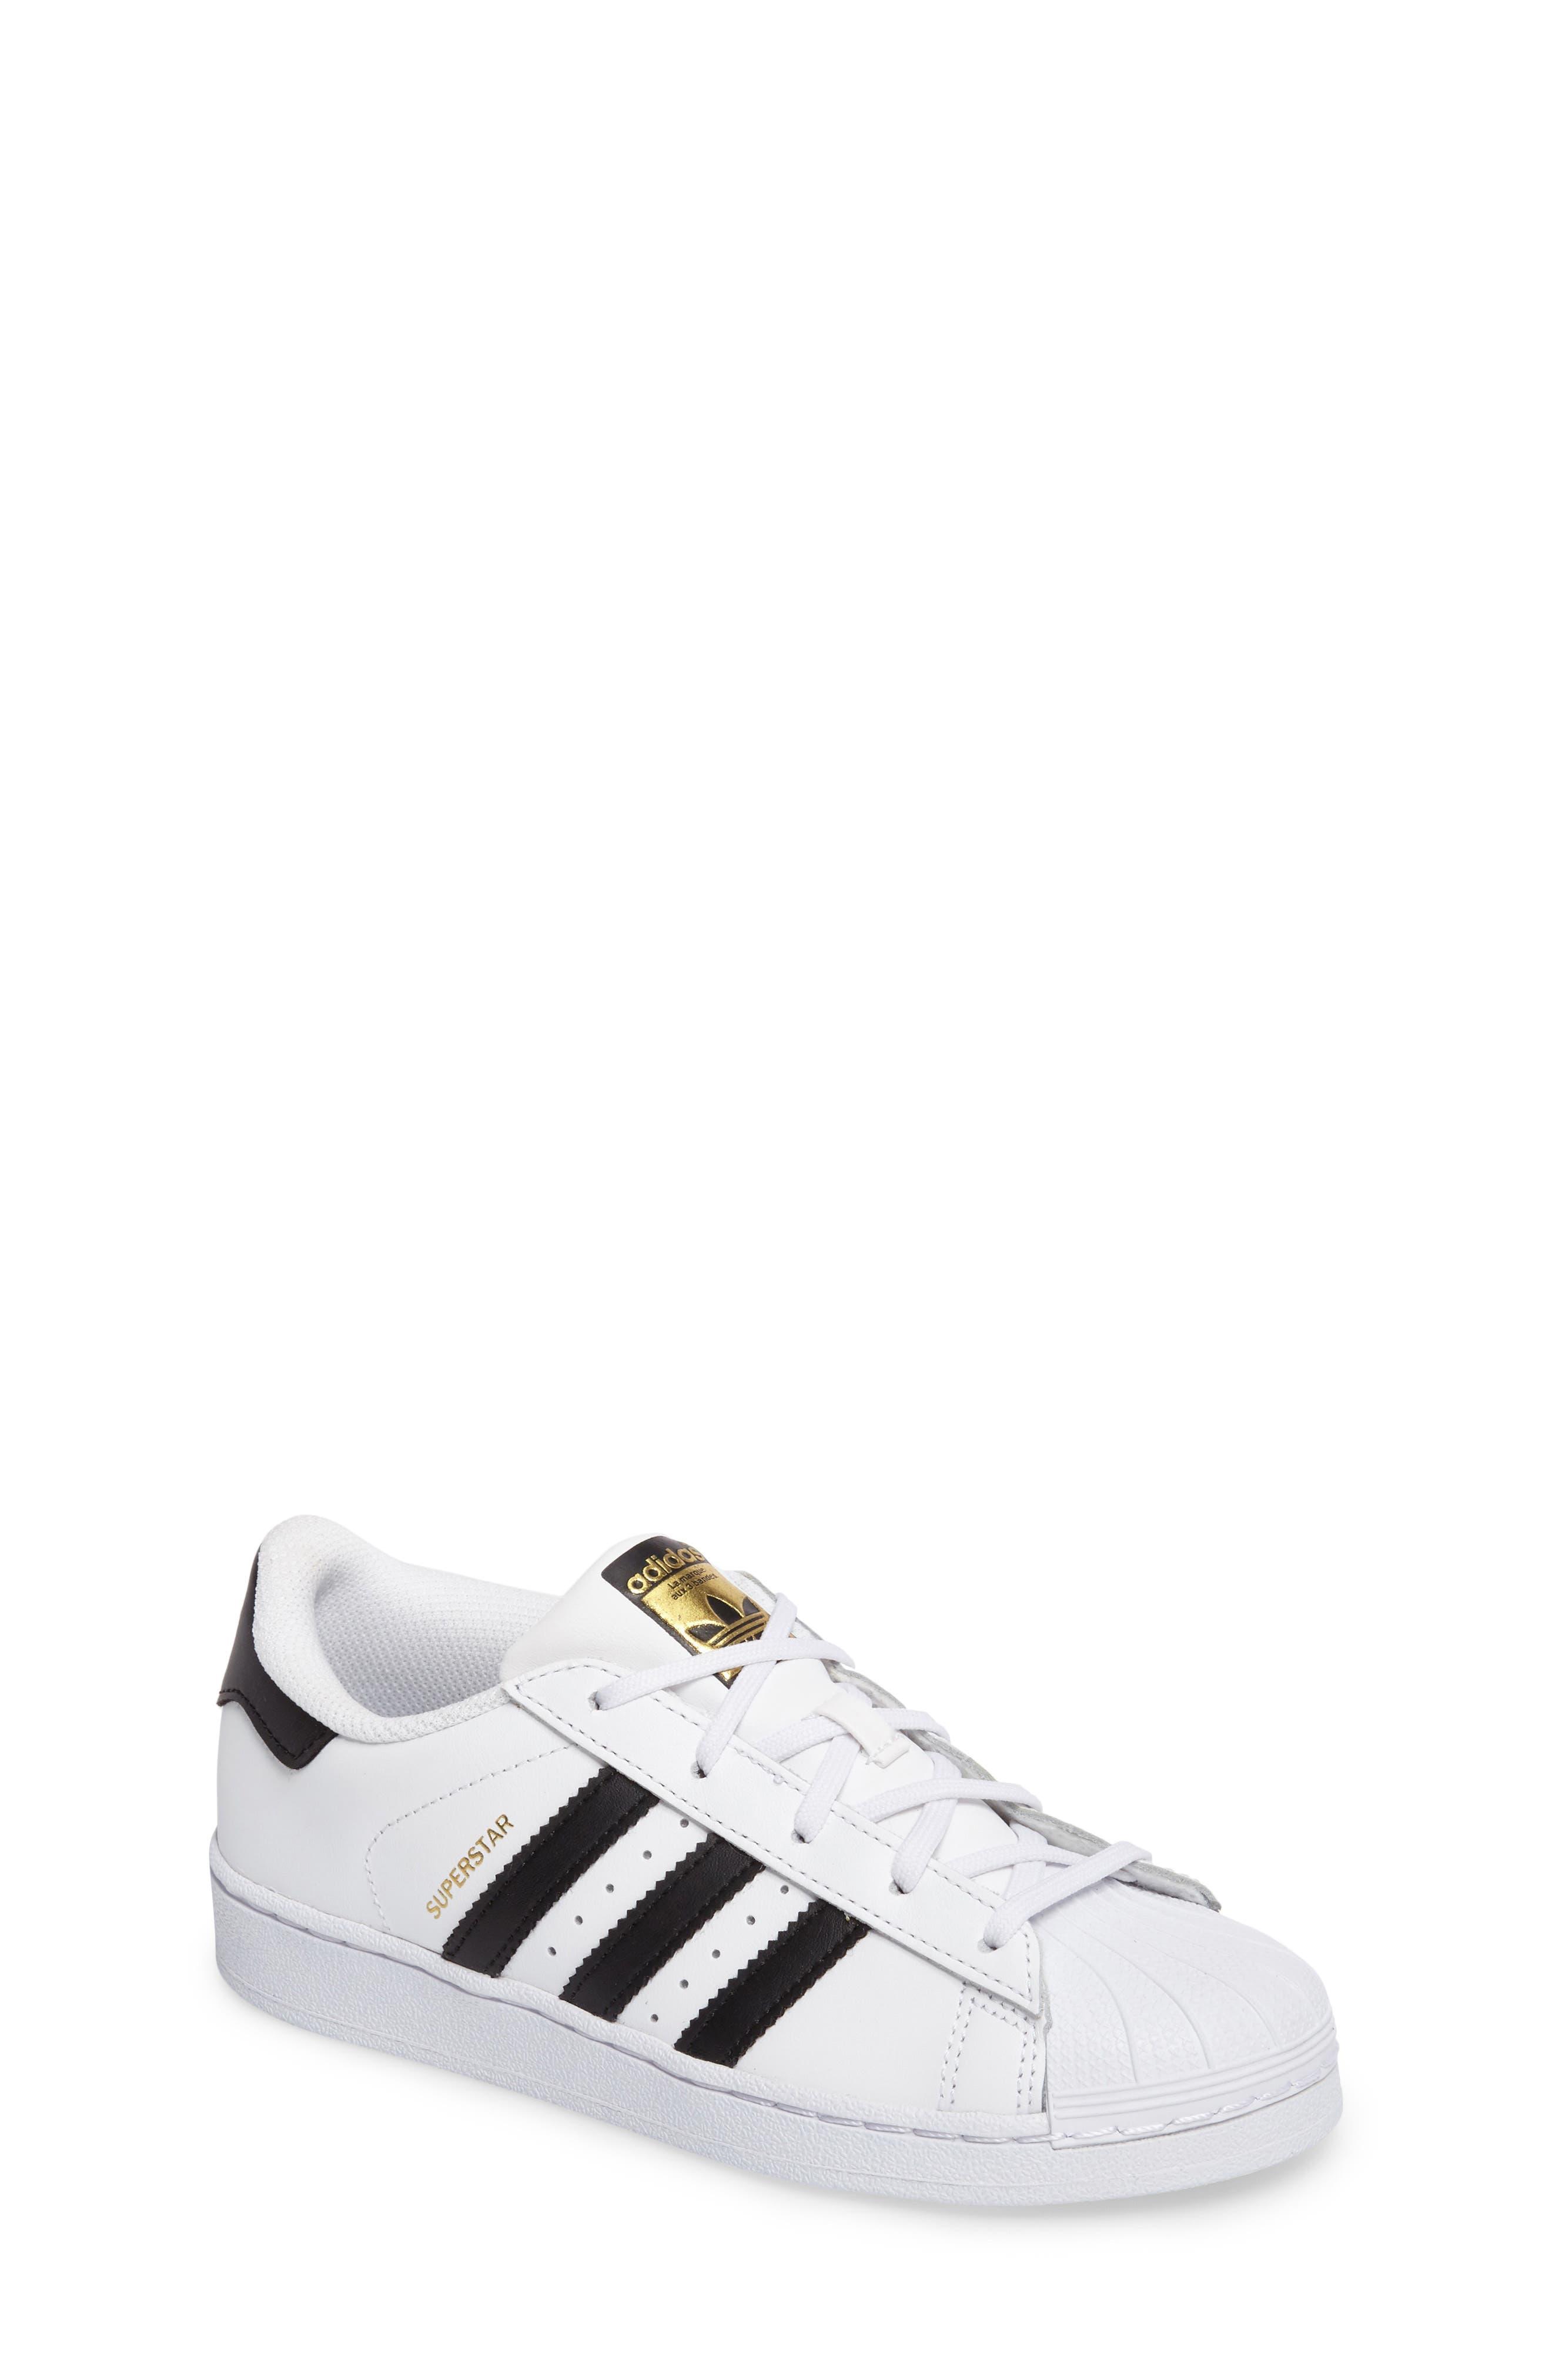 Alternate Image 1 Selected - adidas 'Superstar Foundation' Sneaker (Toddler & Little Kid)